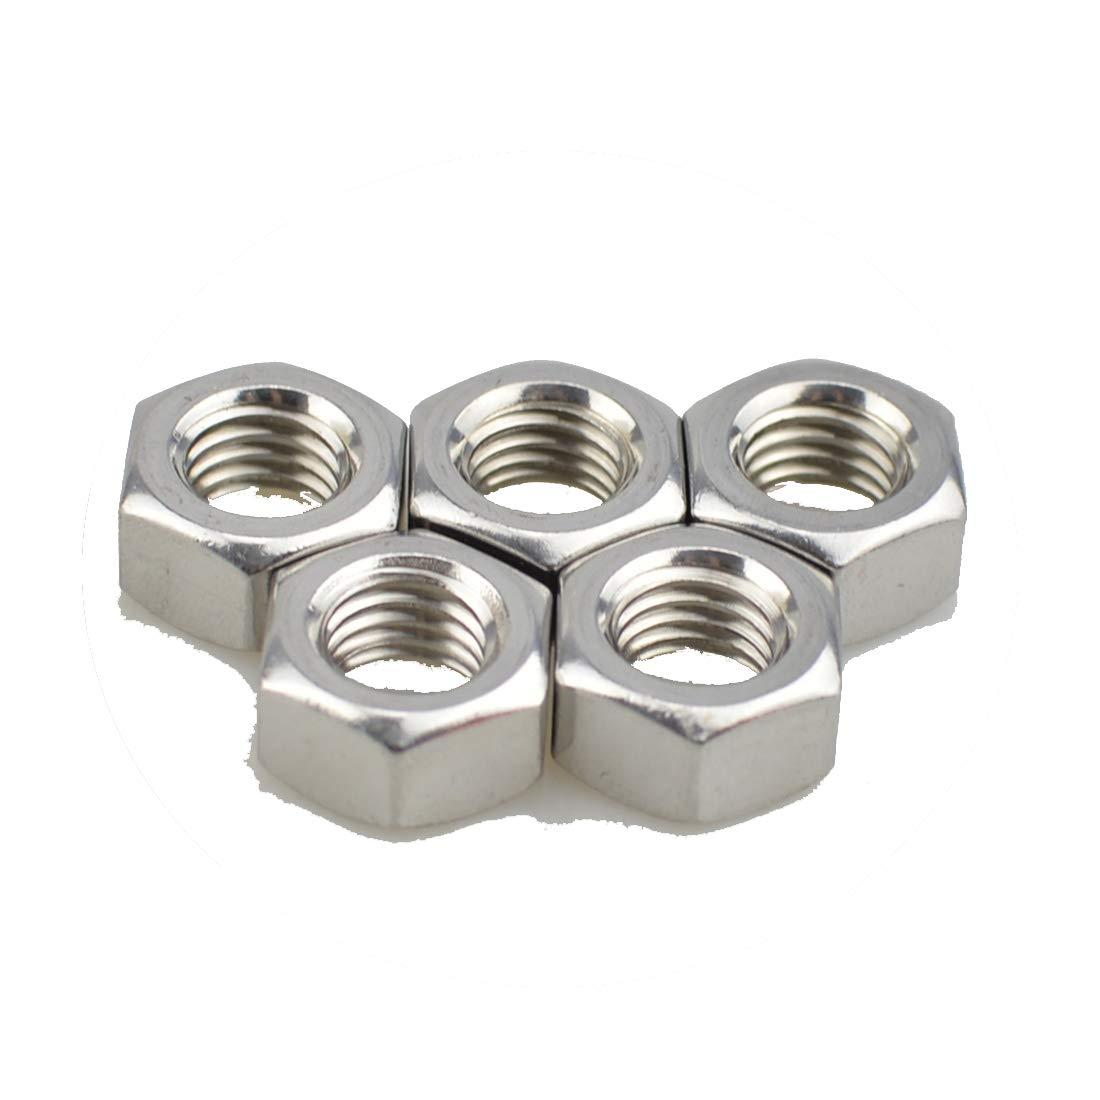 5, M14-2.0 pitch XunLiu 316 Stainless Steel Hex Nut